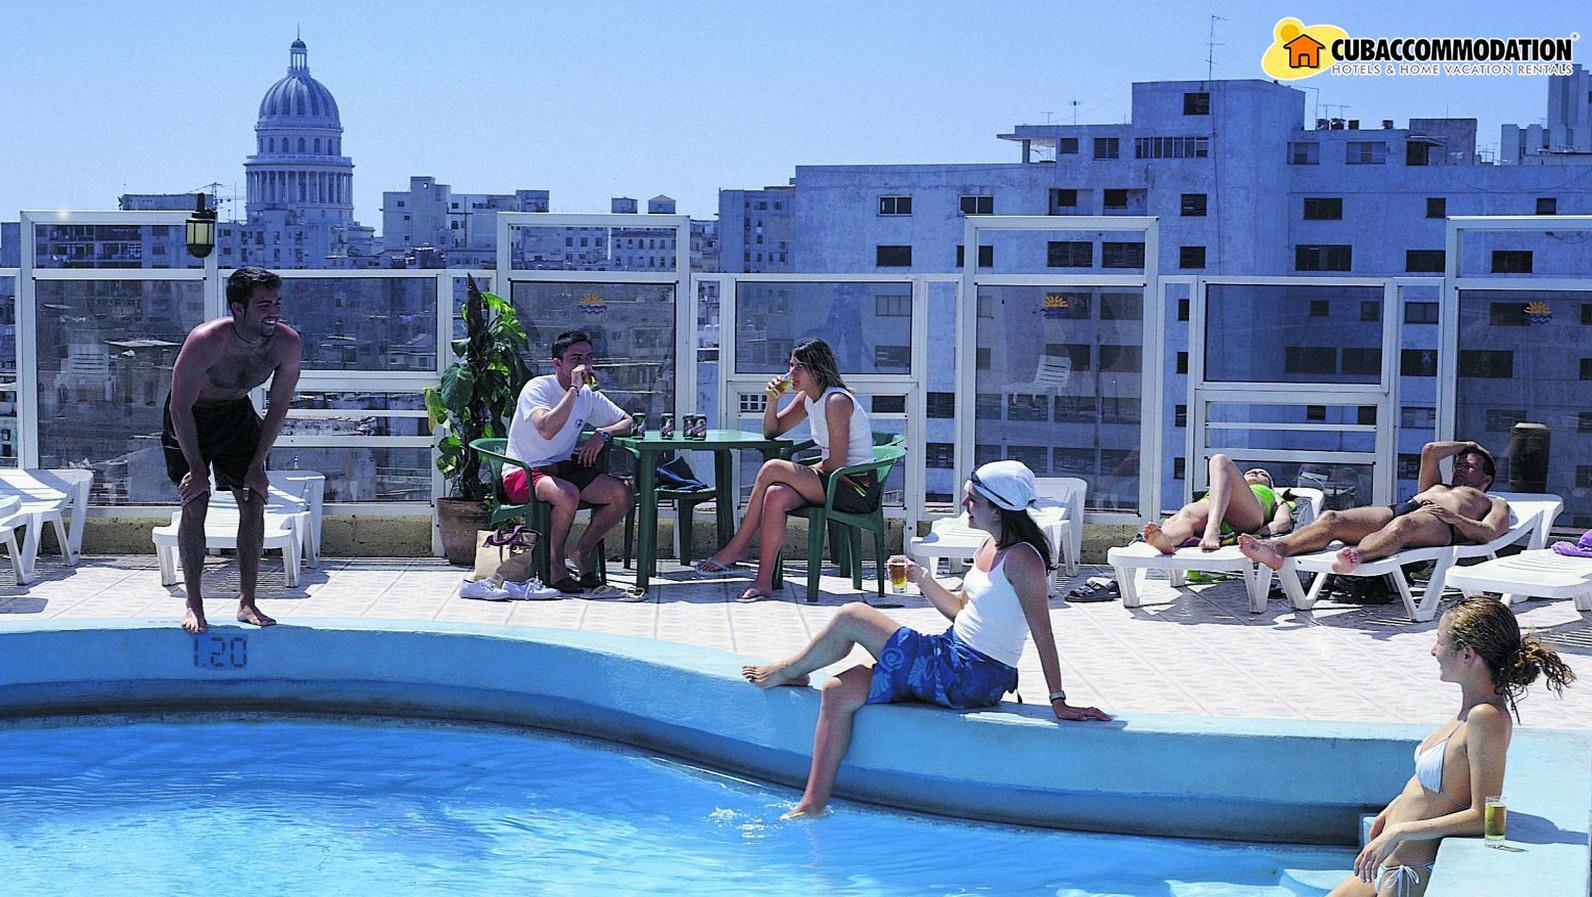 Hotels hotel deauville havana city centro habana home vacation apartment at cuba accommodation - Office du tourisme de cuba ...